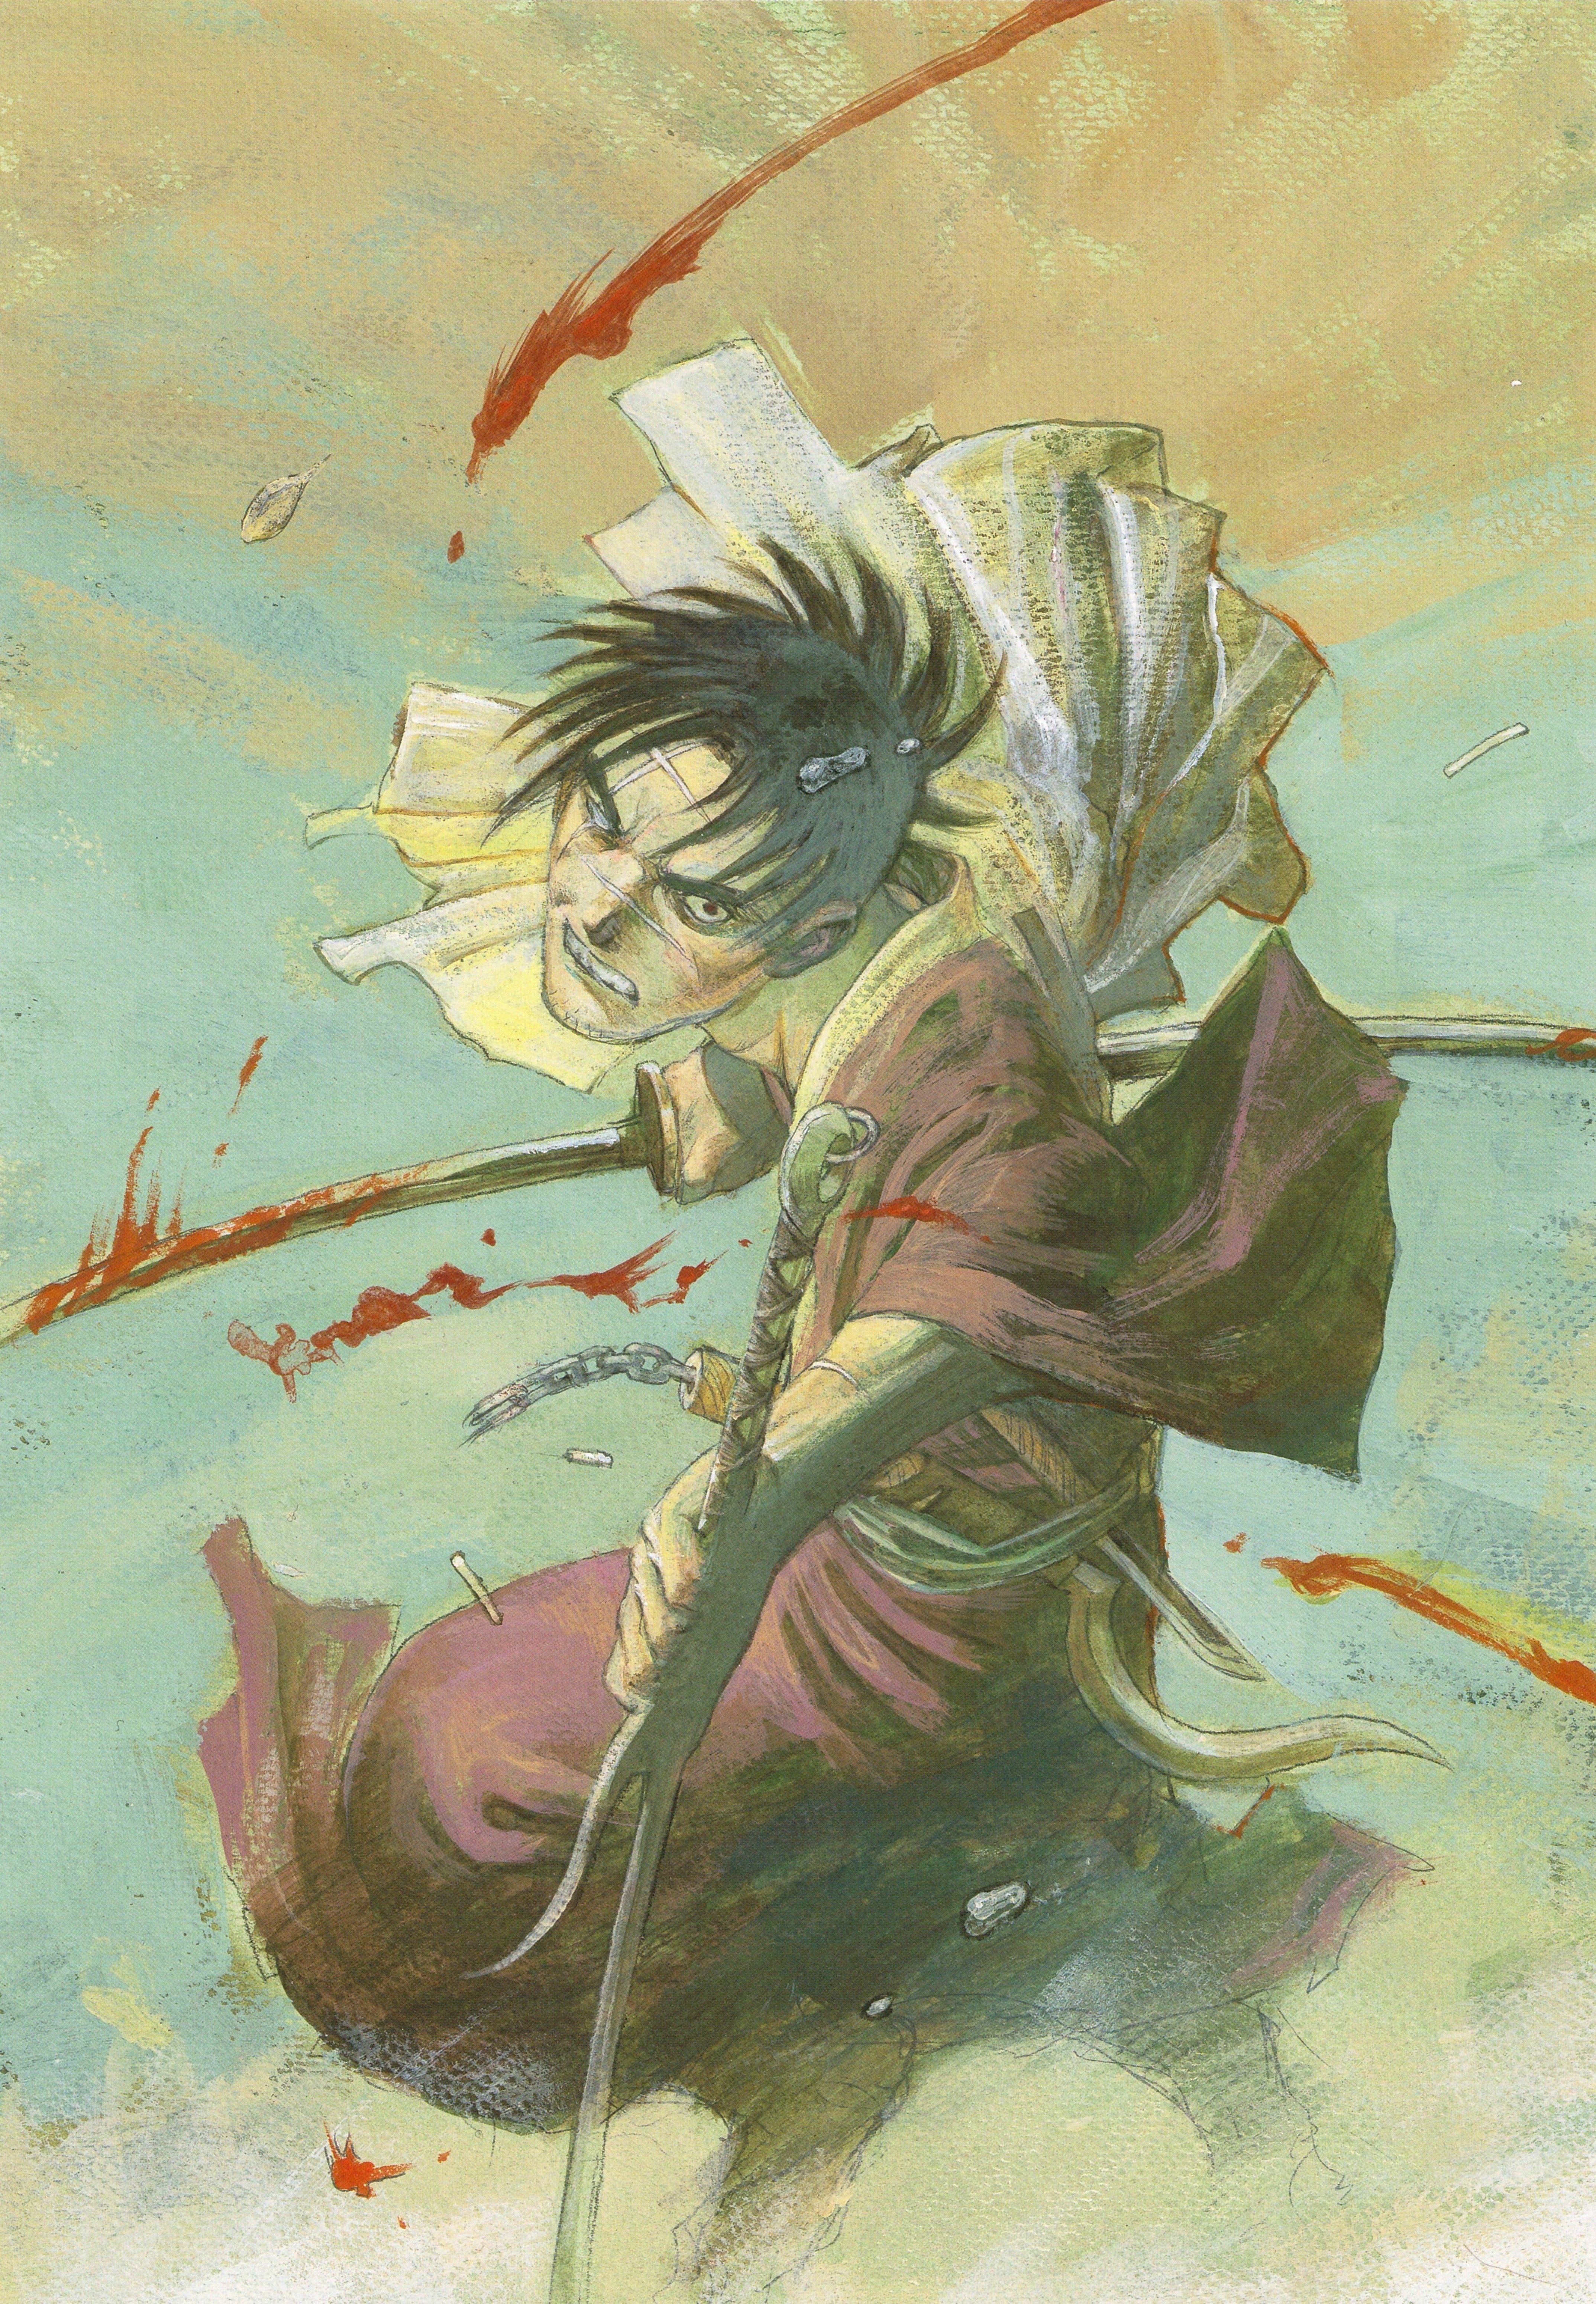 Blade of the İmmortal Blade of the immortal, Dark heart